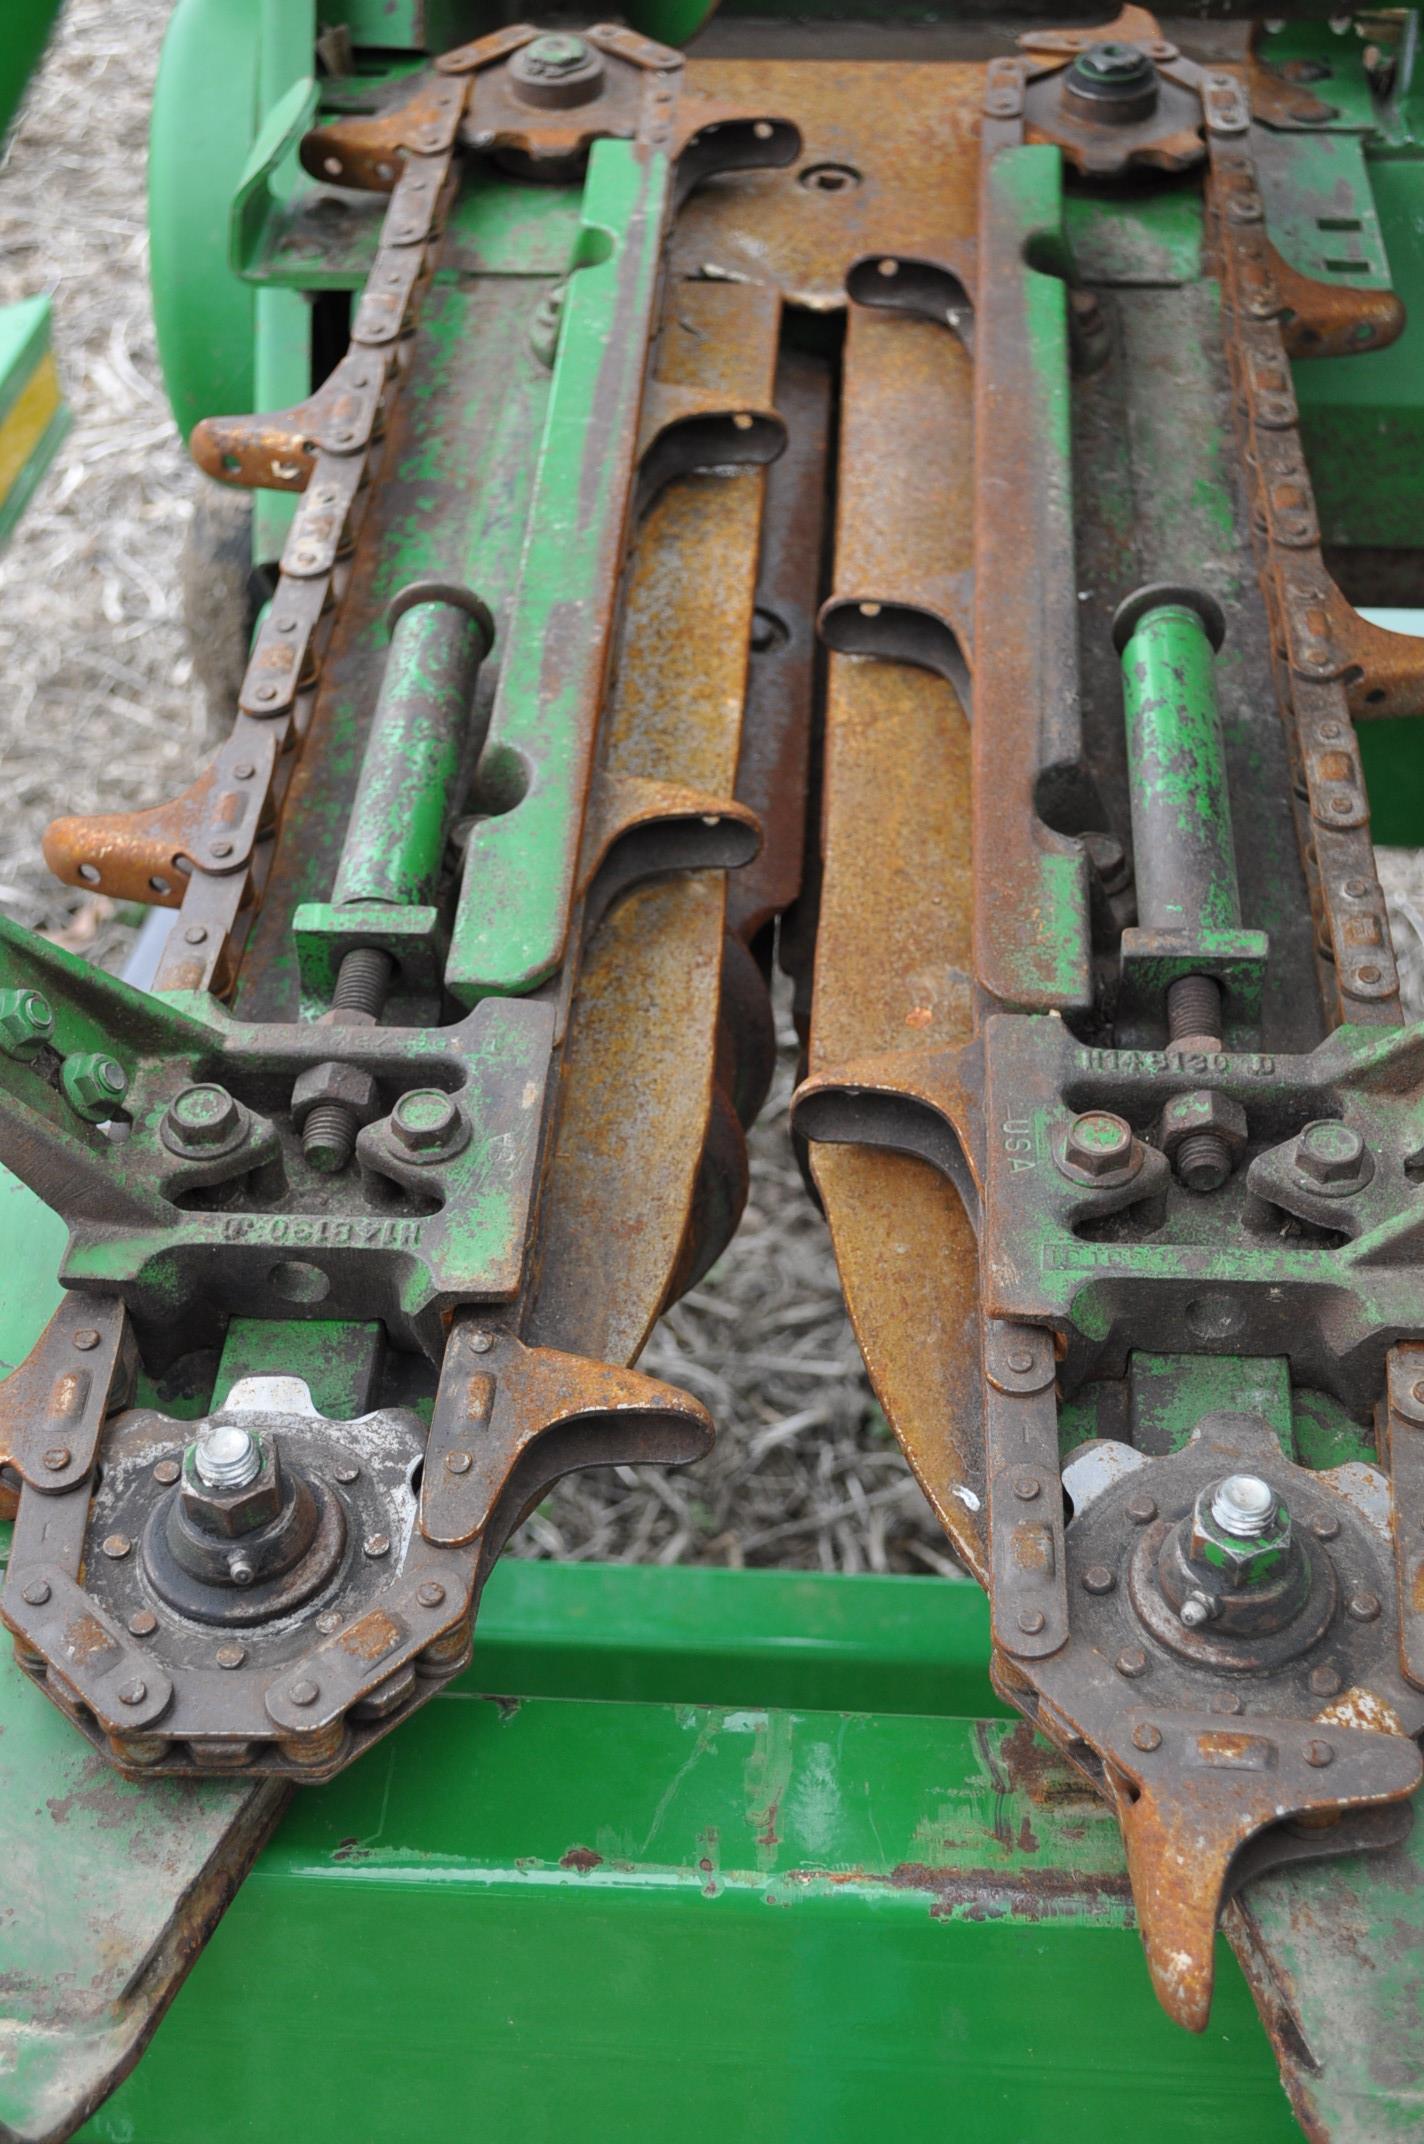 John Deere 693 corn head, poly, hyd drive, down corn reel, pto shafts, SN 655654 - Image 11 of 17